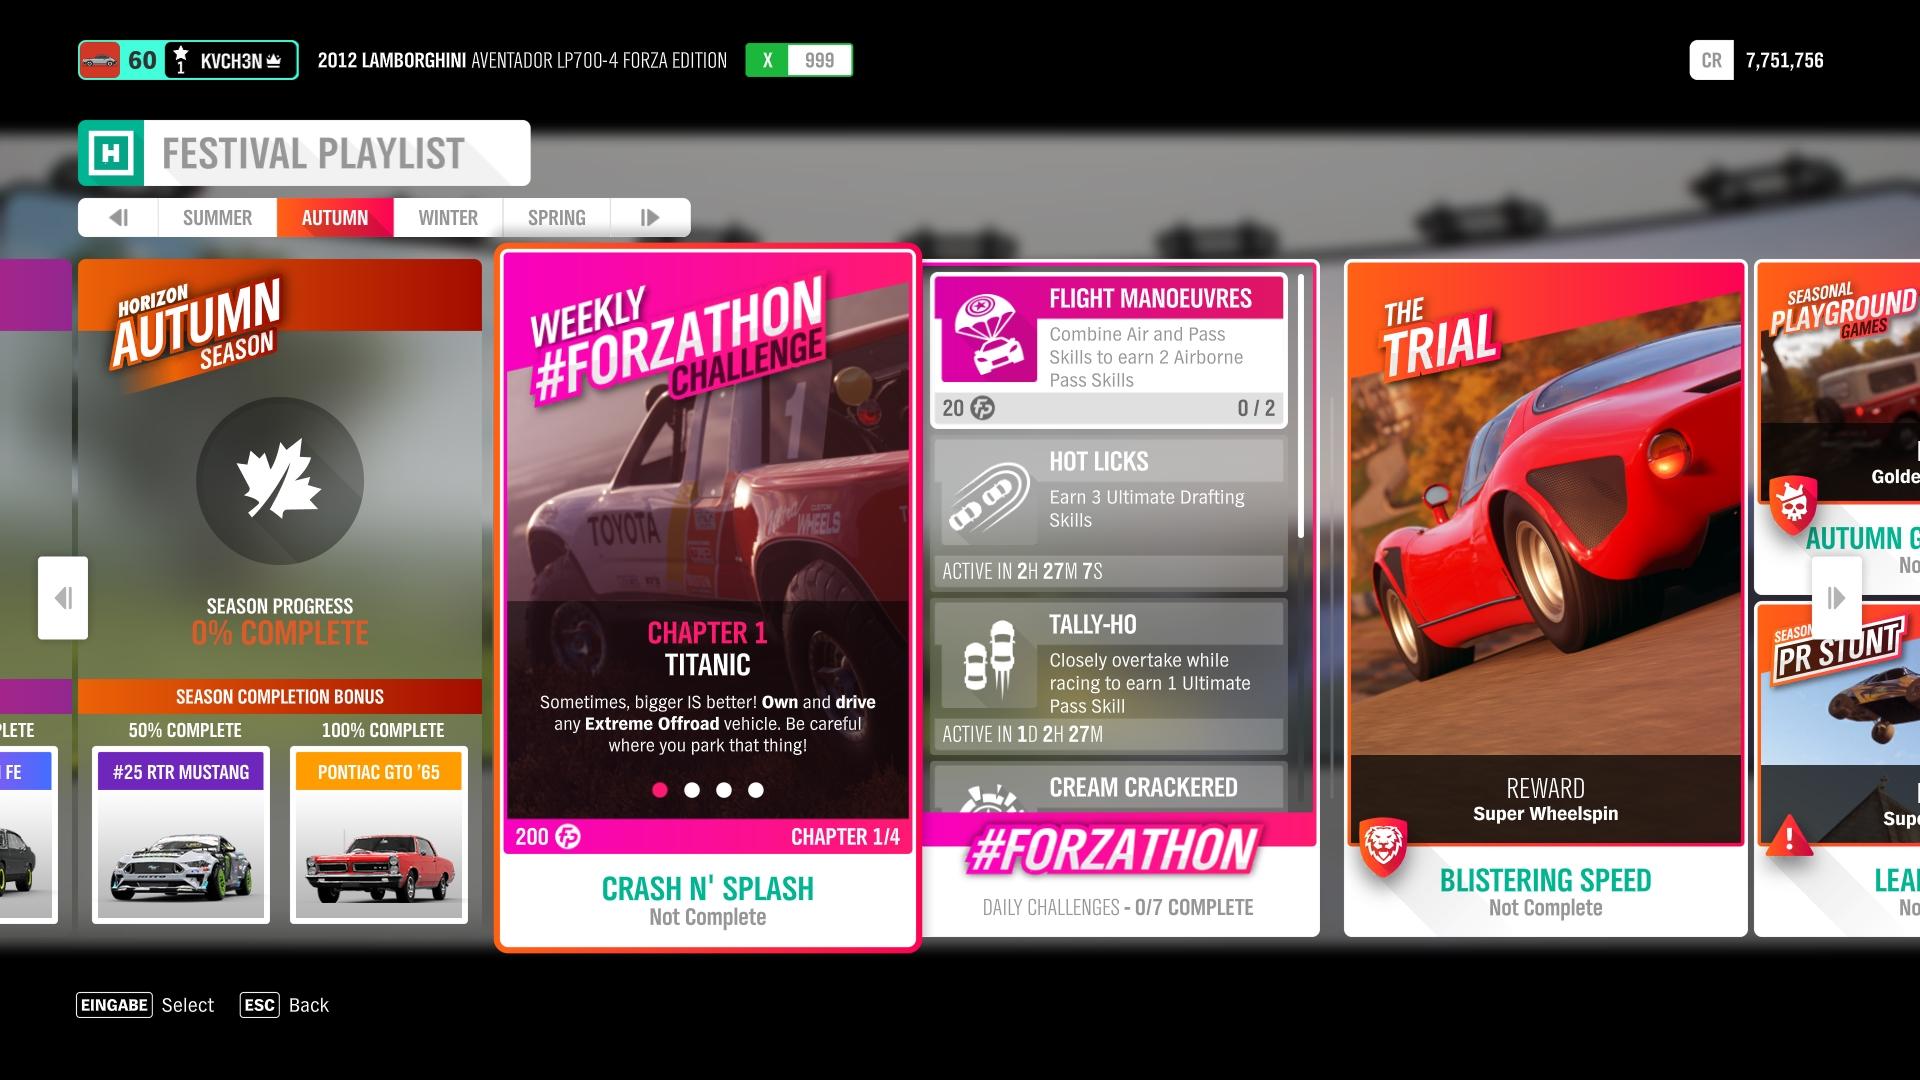 Forza Horizon 4/Update Seven/Autumn Season | Forza Motorsport Wiki